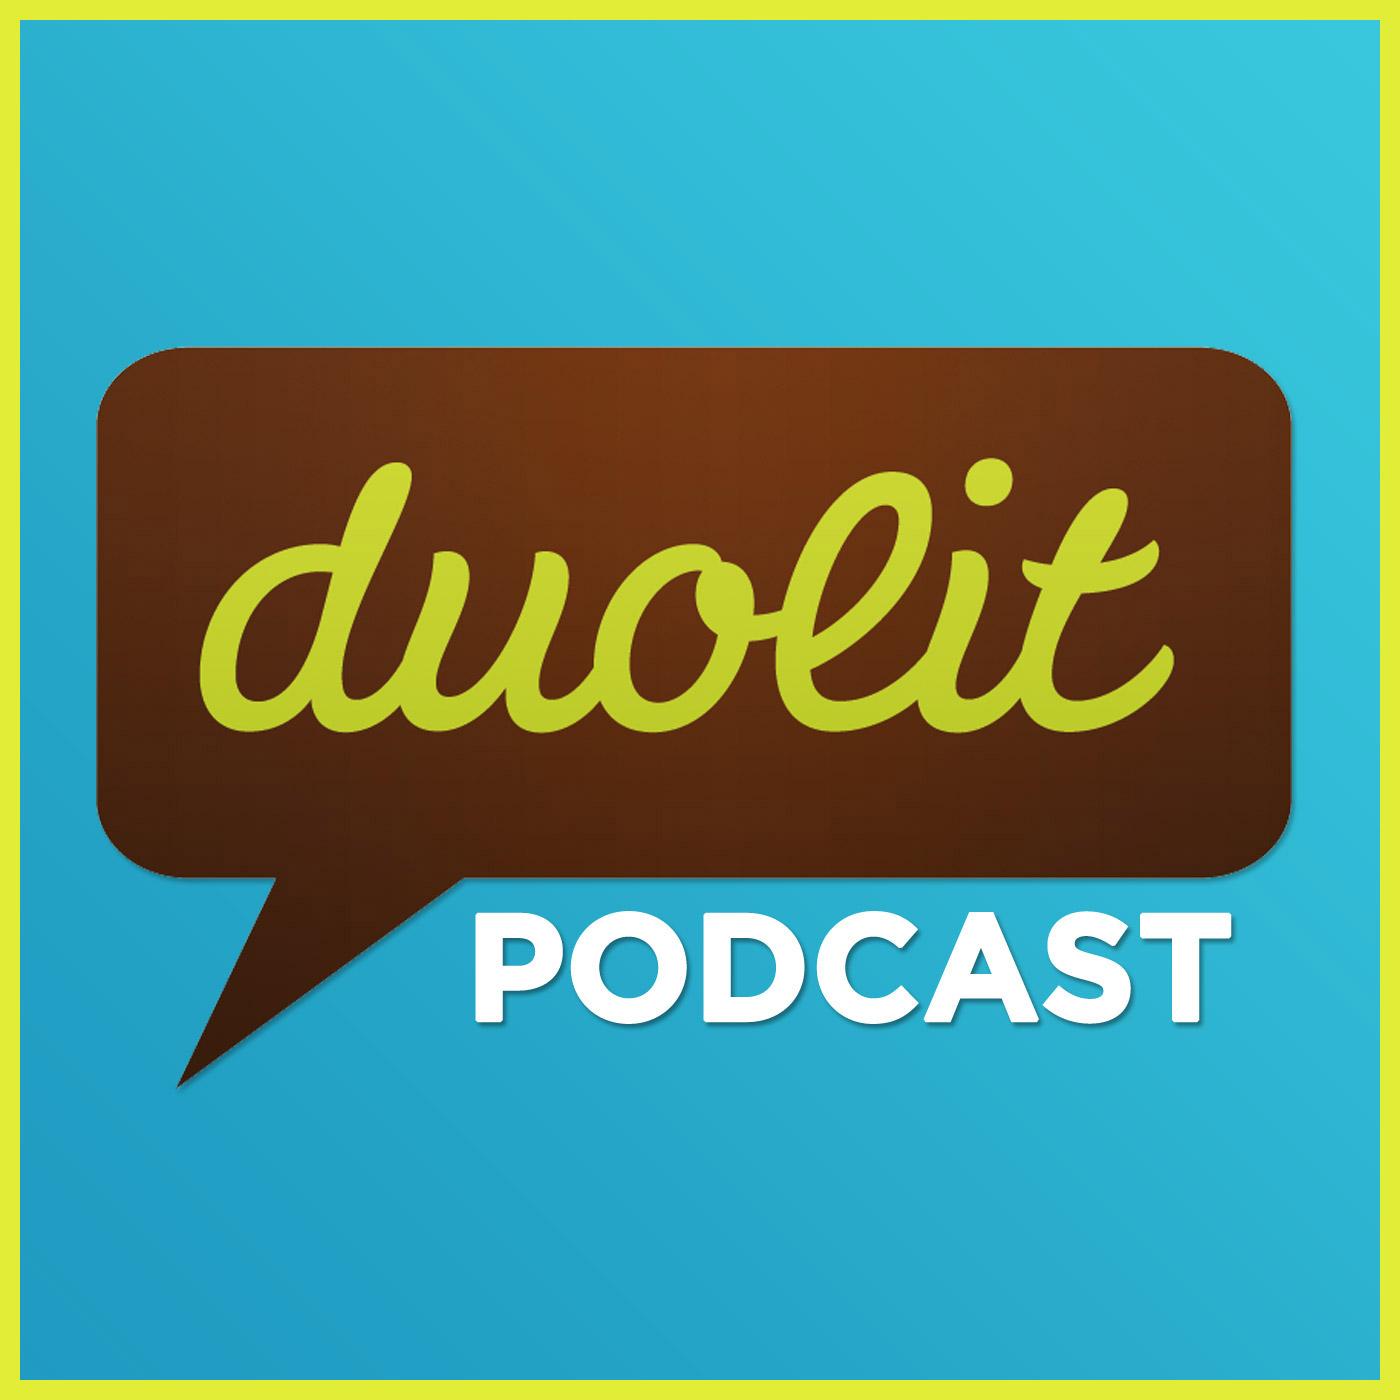 Duolit Self-Publishing and Book Marketing Podcast